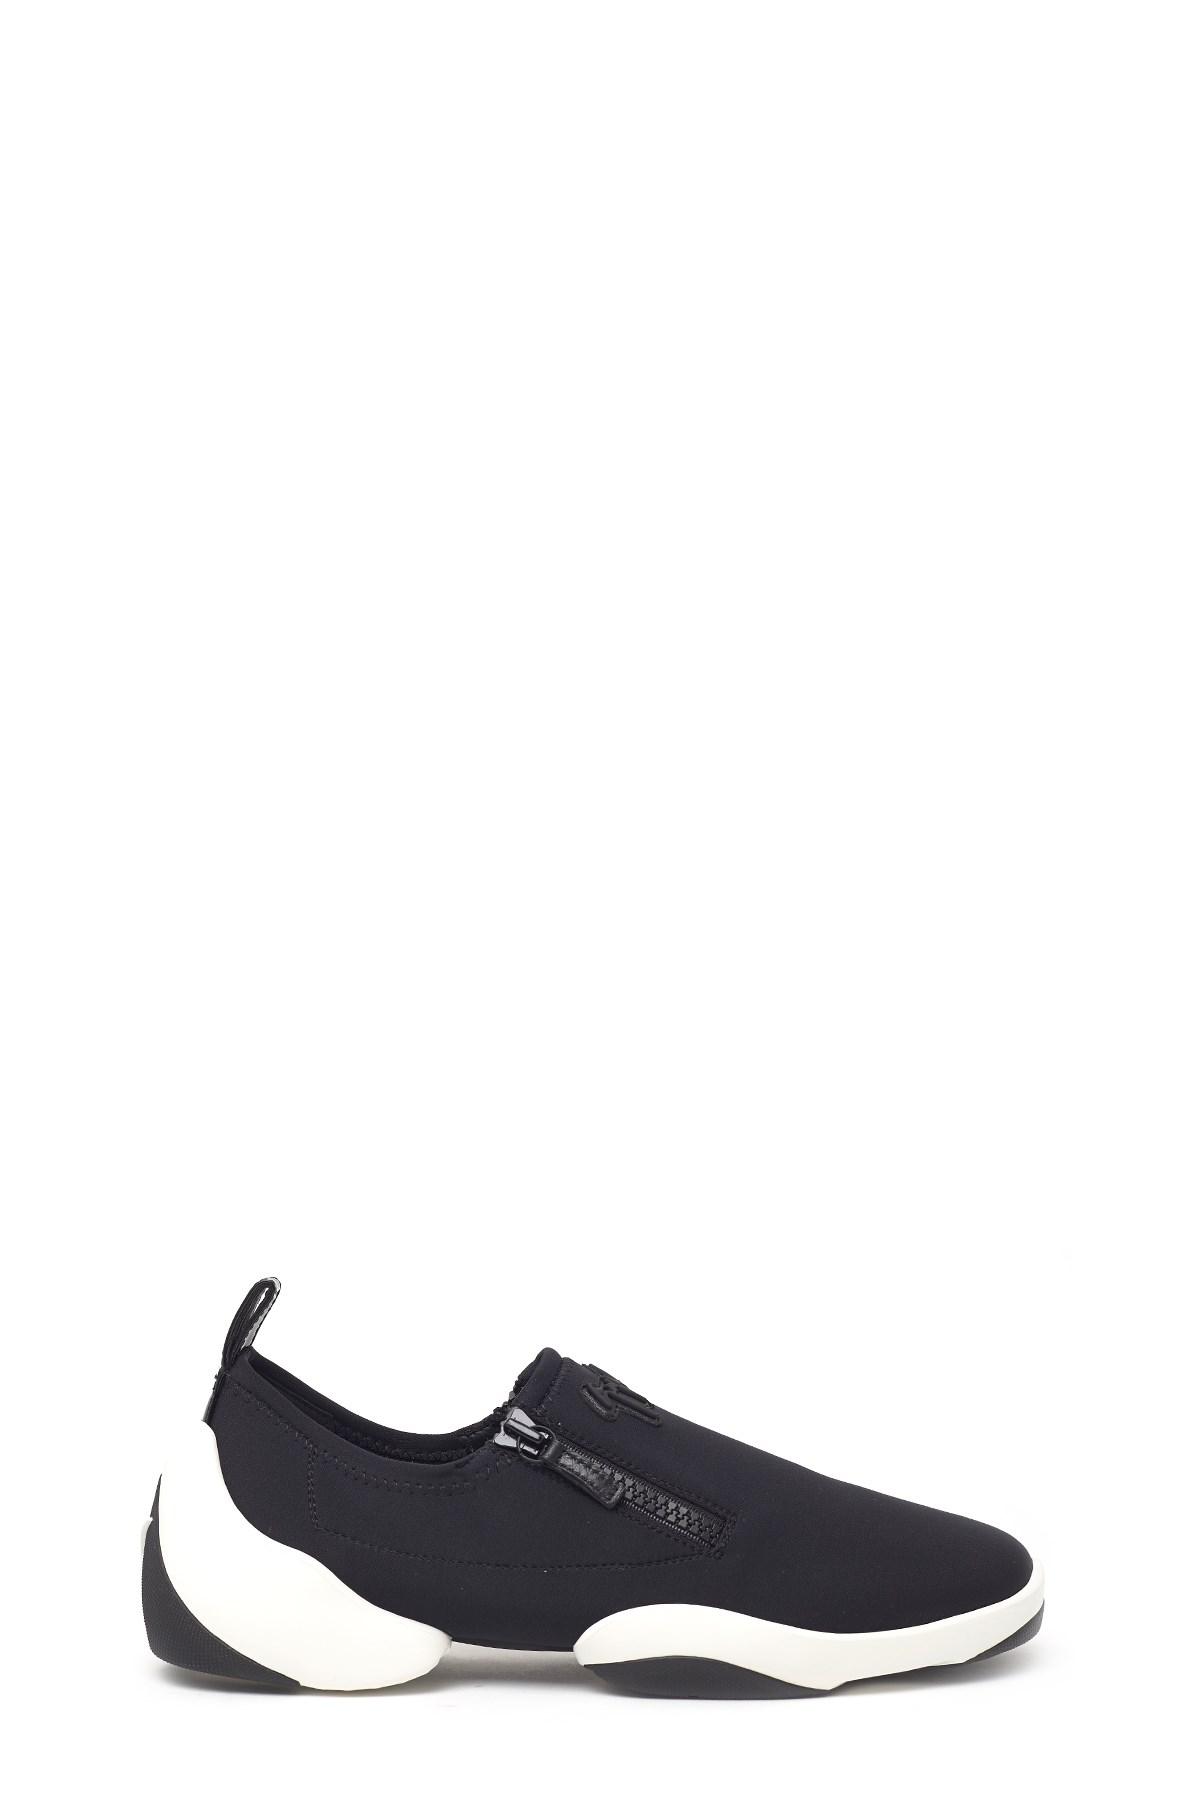 ca922674882ea giuseppe zanotti 'light jump' sneakers available on julian-fashion ...